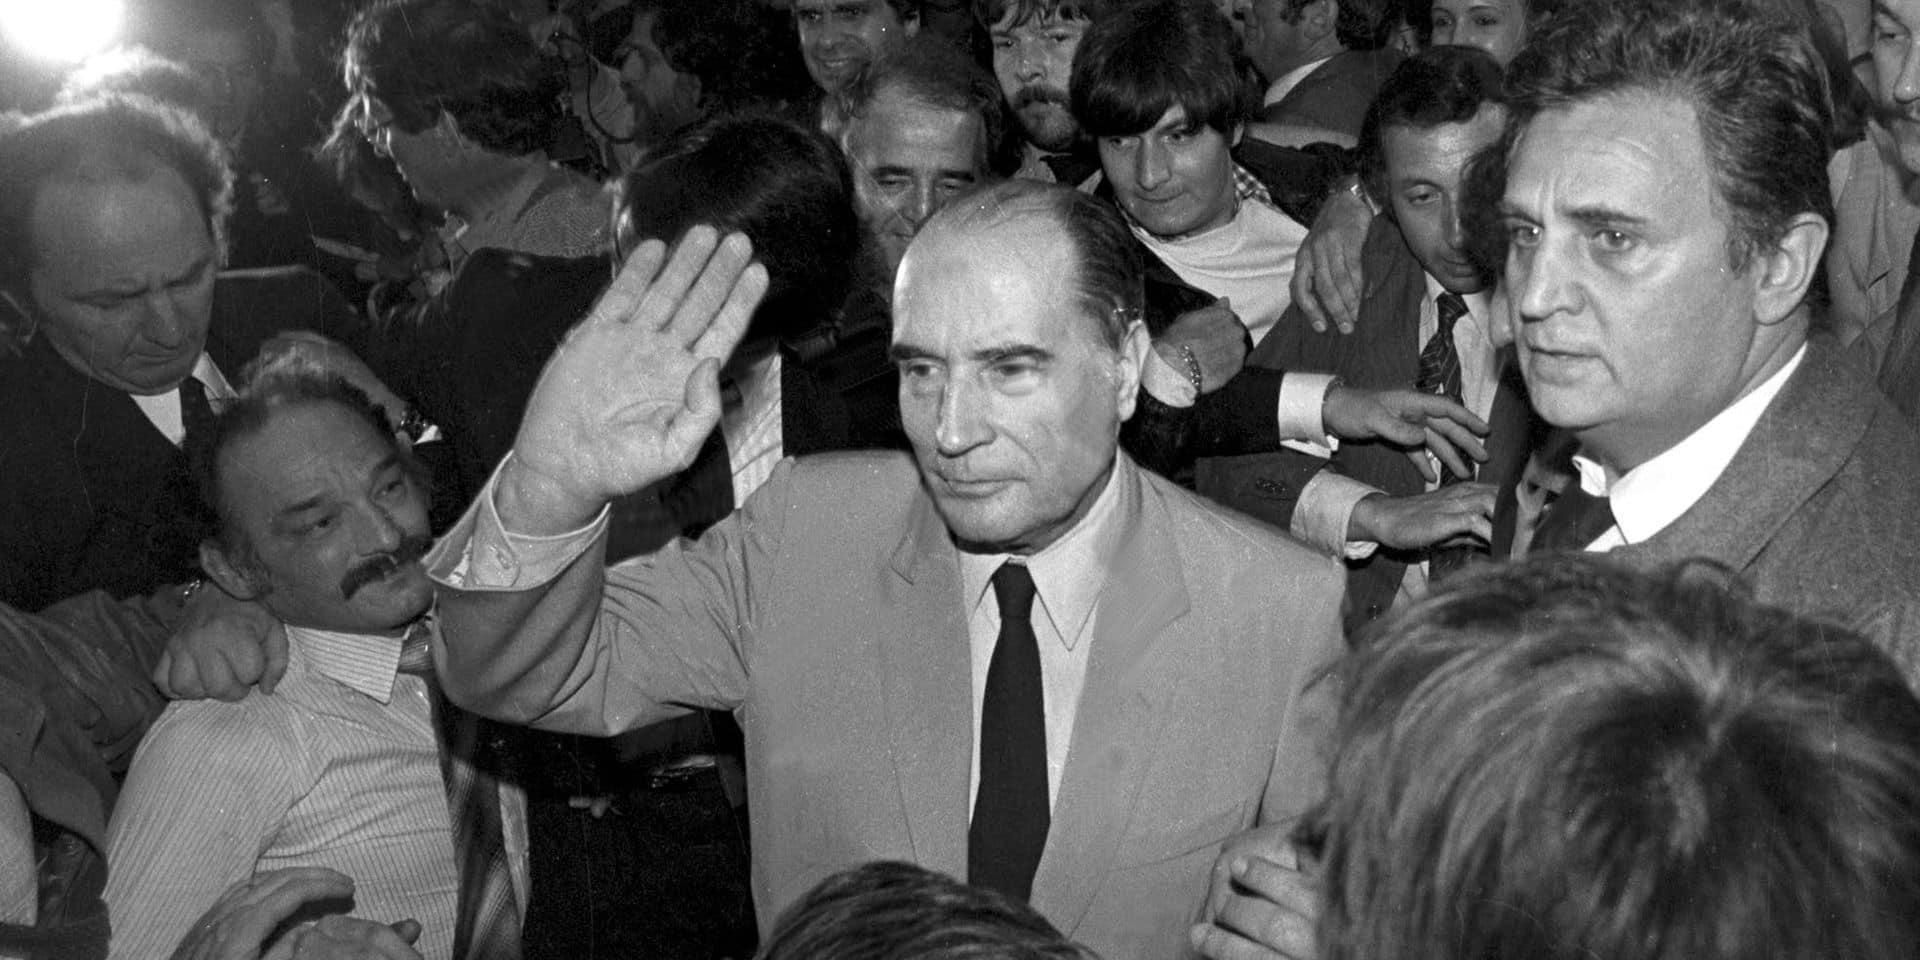 ELECTION MITTERRAND 1981